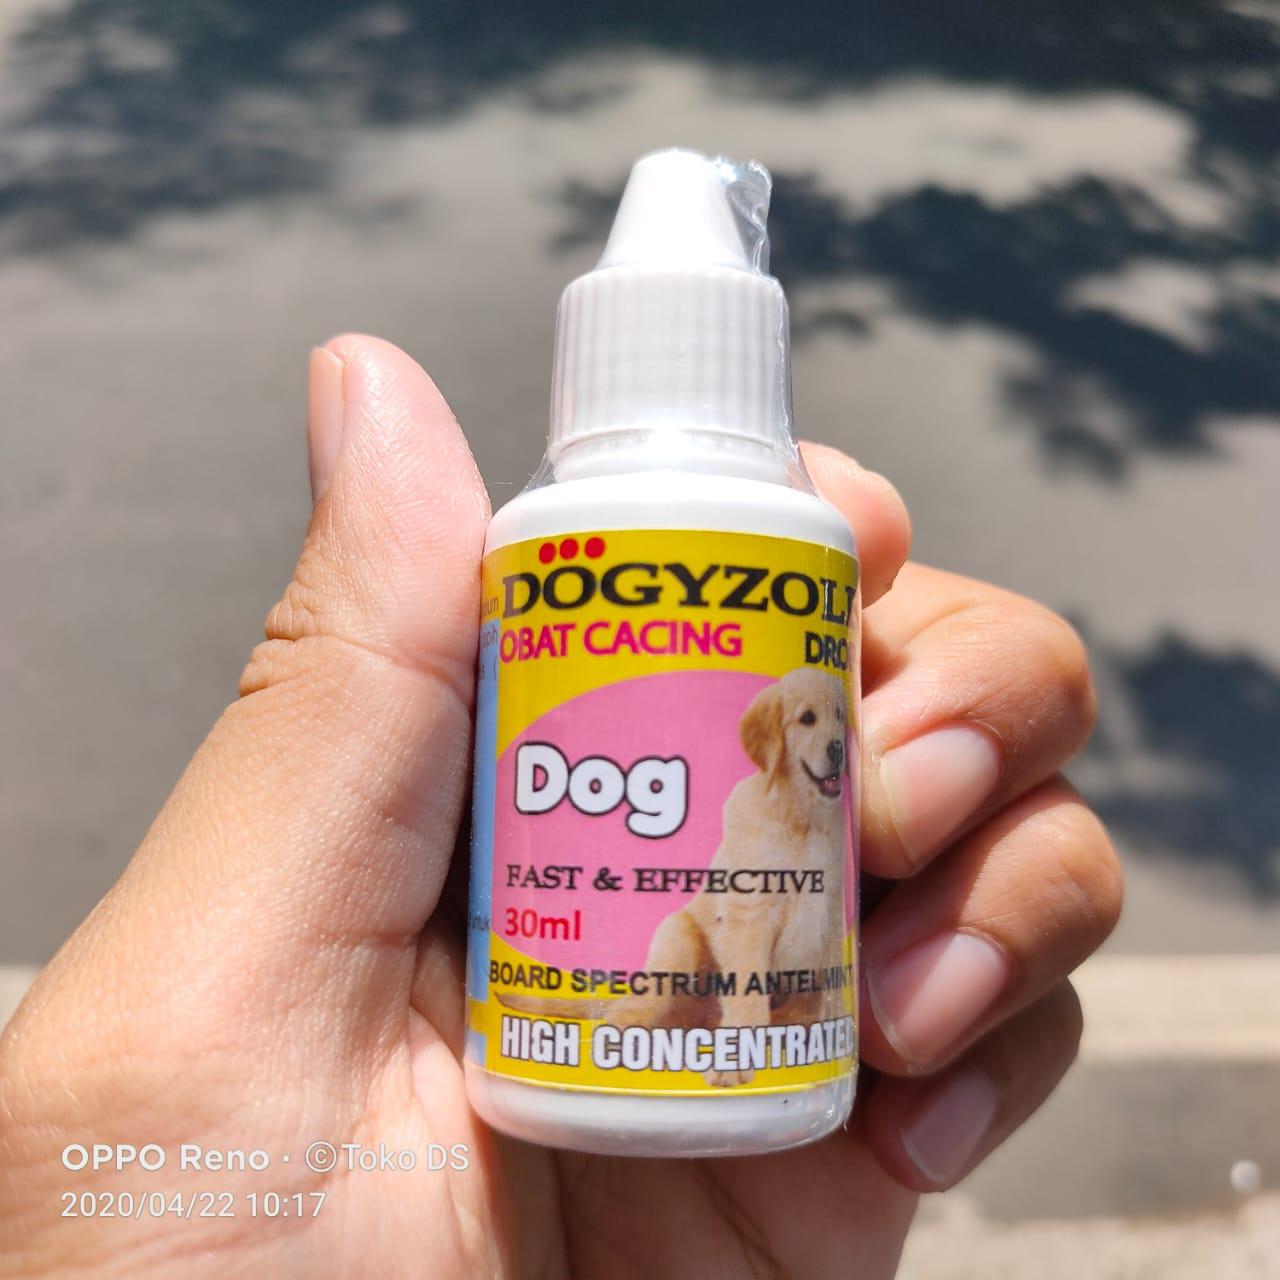 Dogyzole Drop 30ml Obat Cacing Anjing Liquid Obat Cacing Puppy Ampuh Lazada Indonesia